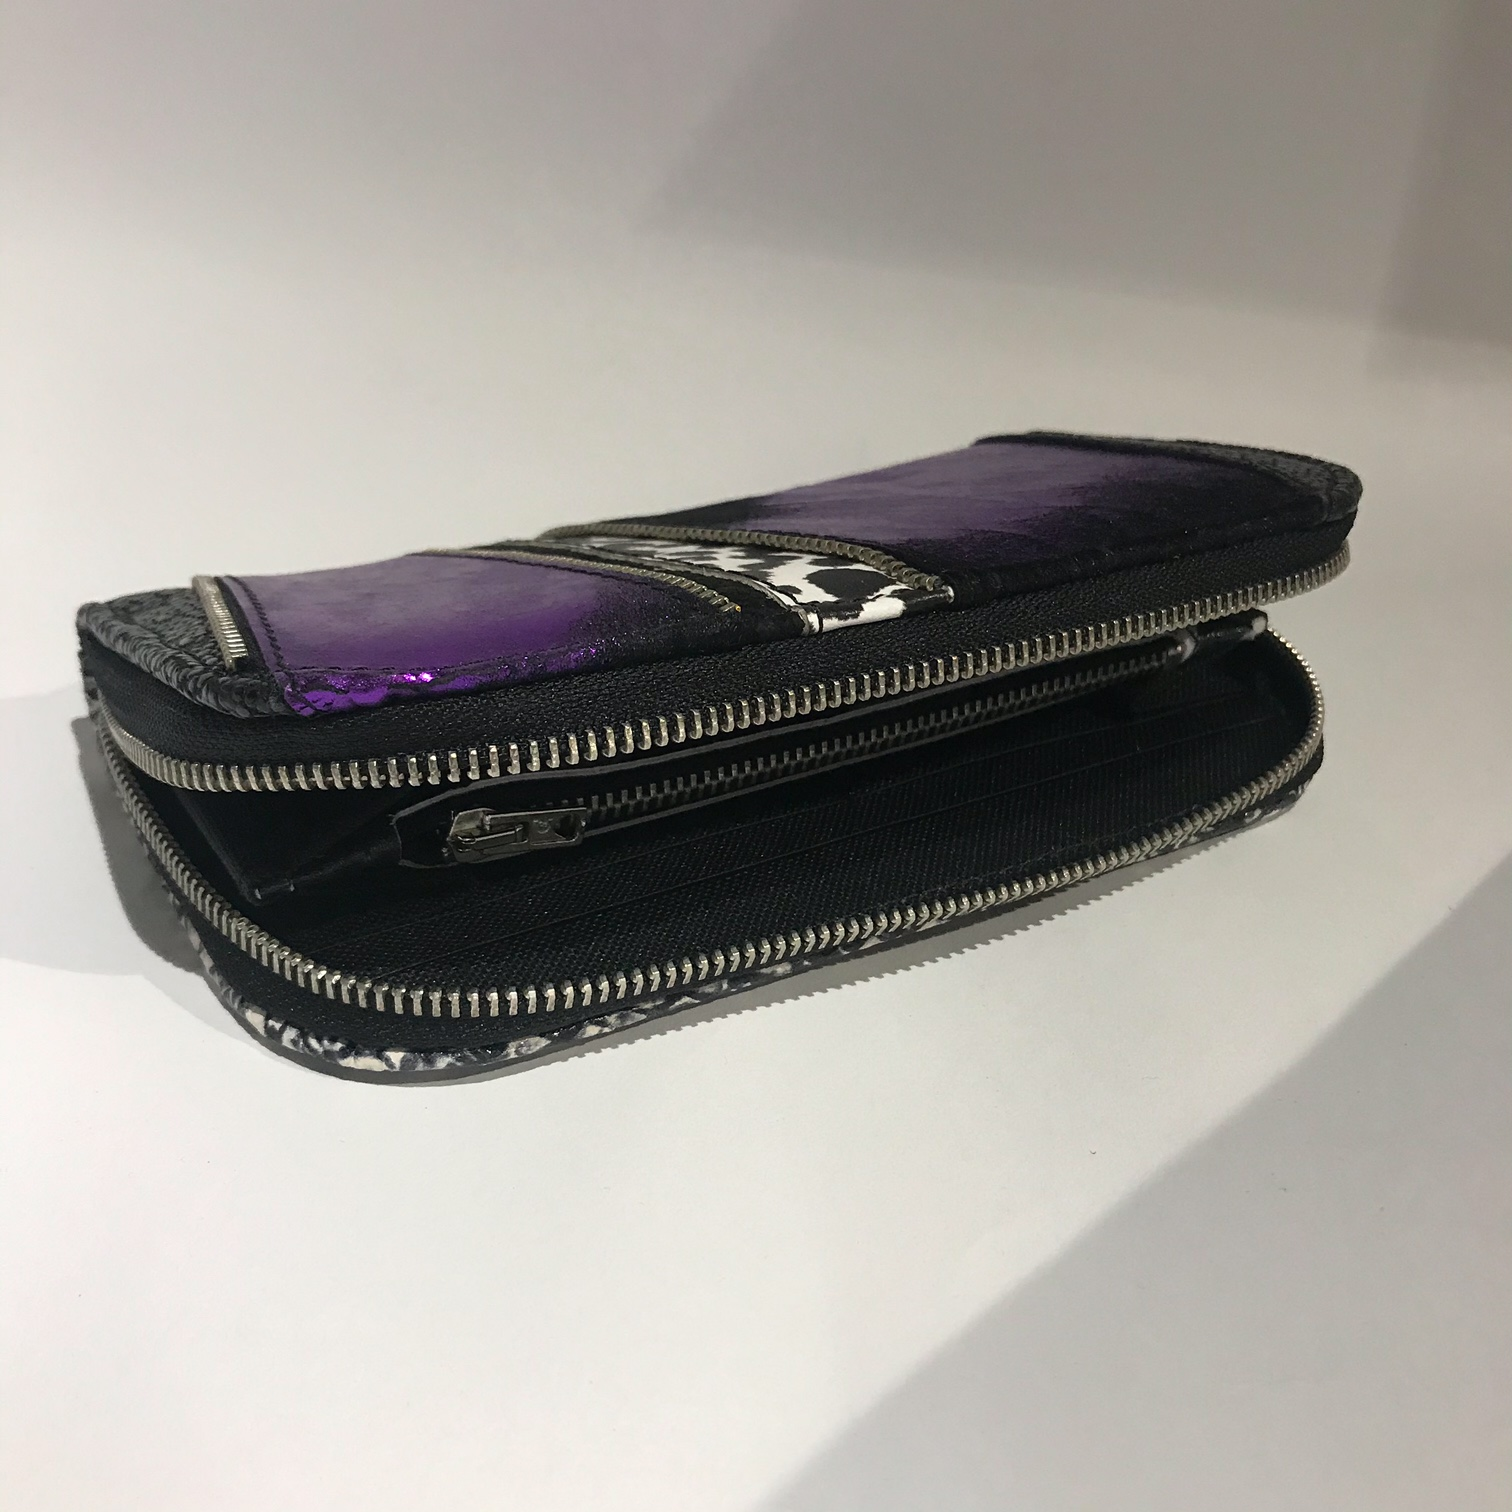 Purple Cavallino Chic Maxi Wallet EvilEve